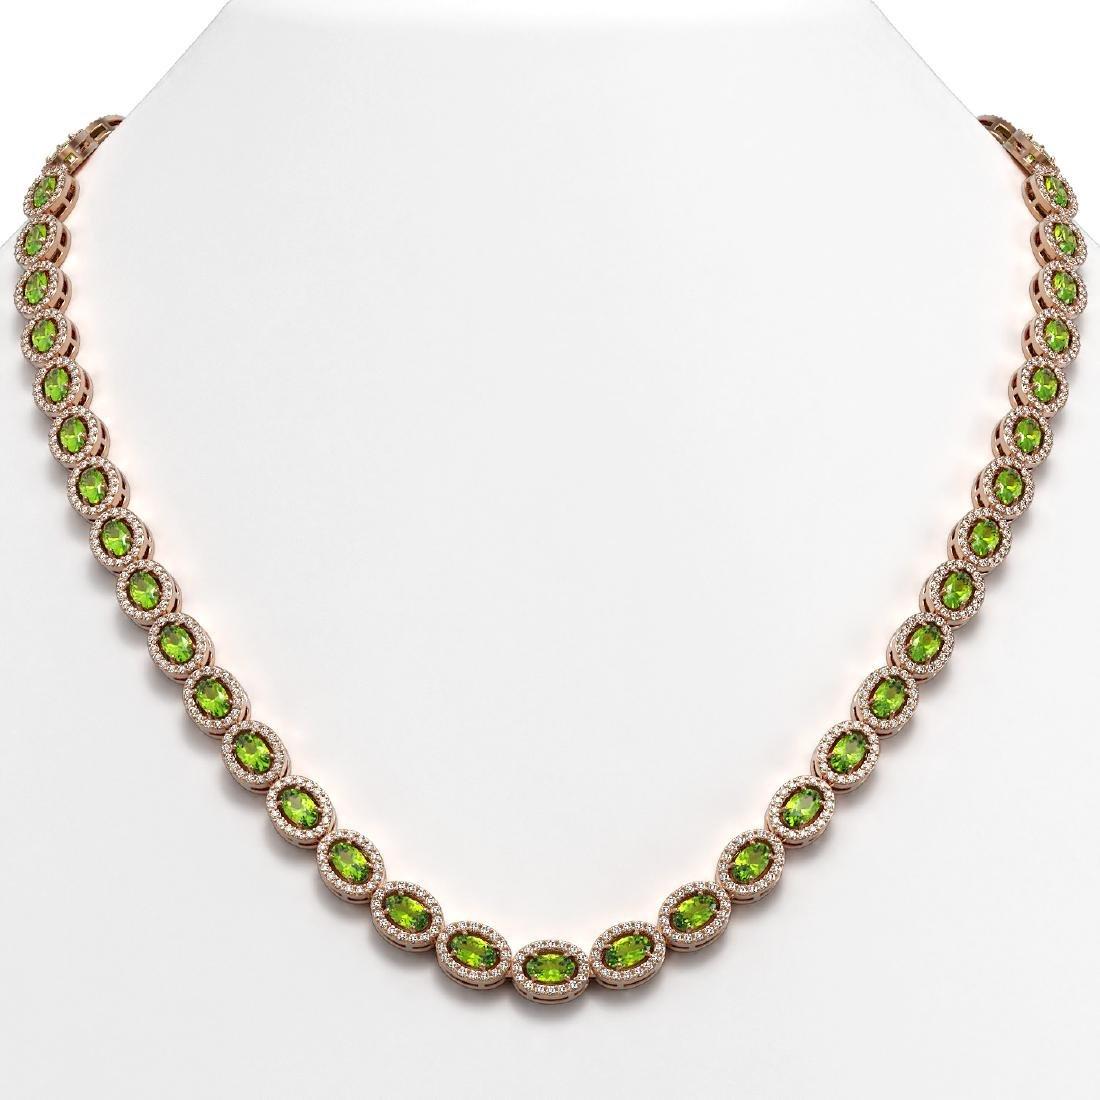 23.86 CTW Peridot & Diamond Halo Necklace 10K Rose Gold